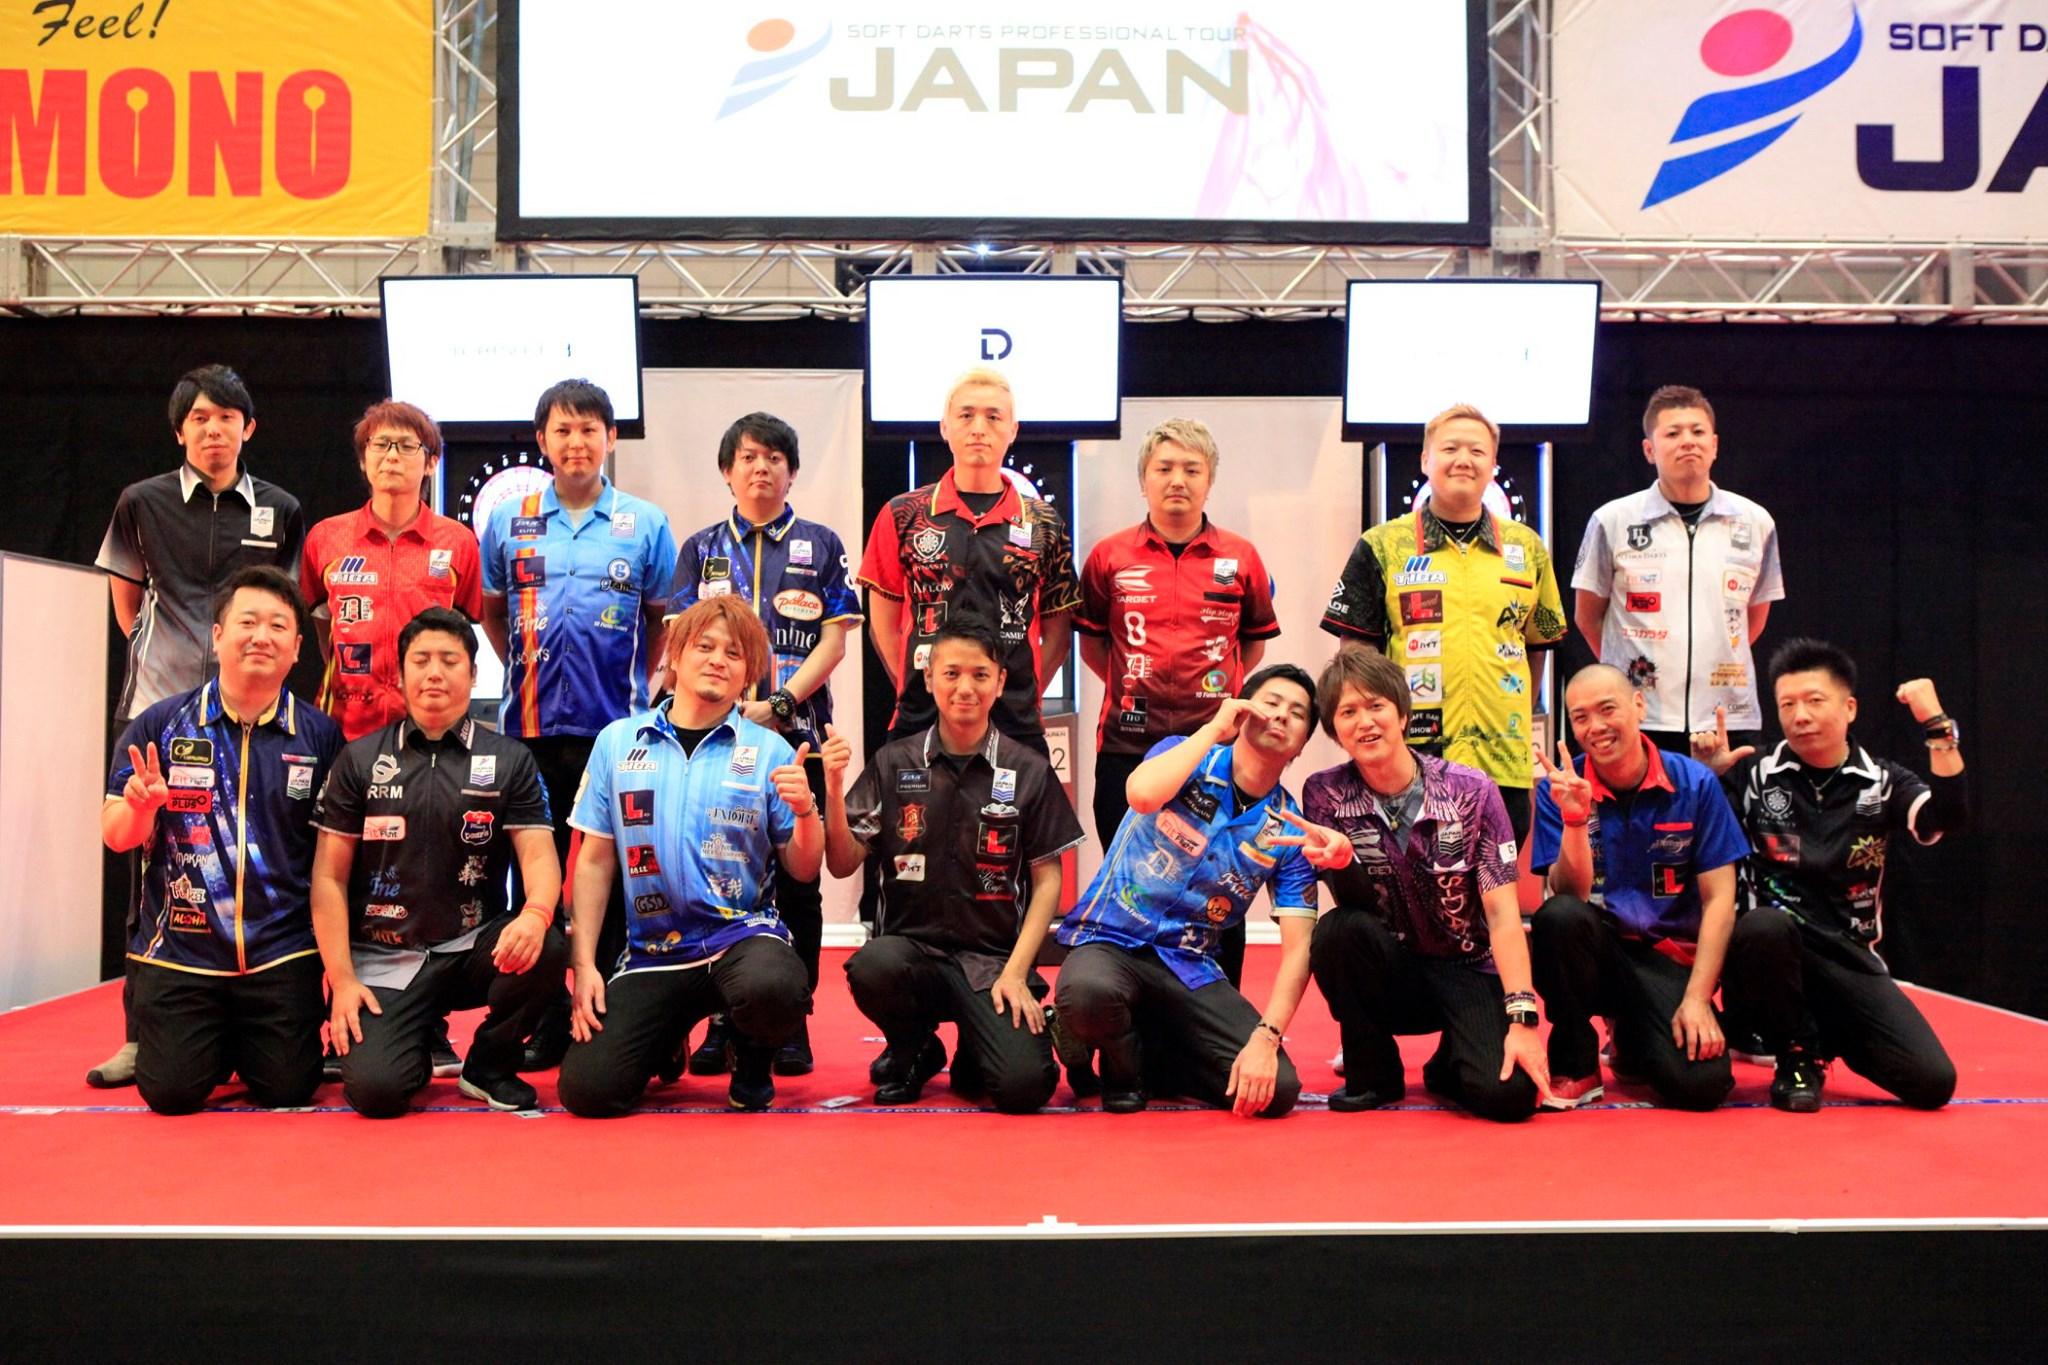 【JAPAN 2019】STAGE 13 千葉:JAPAN 16